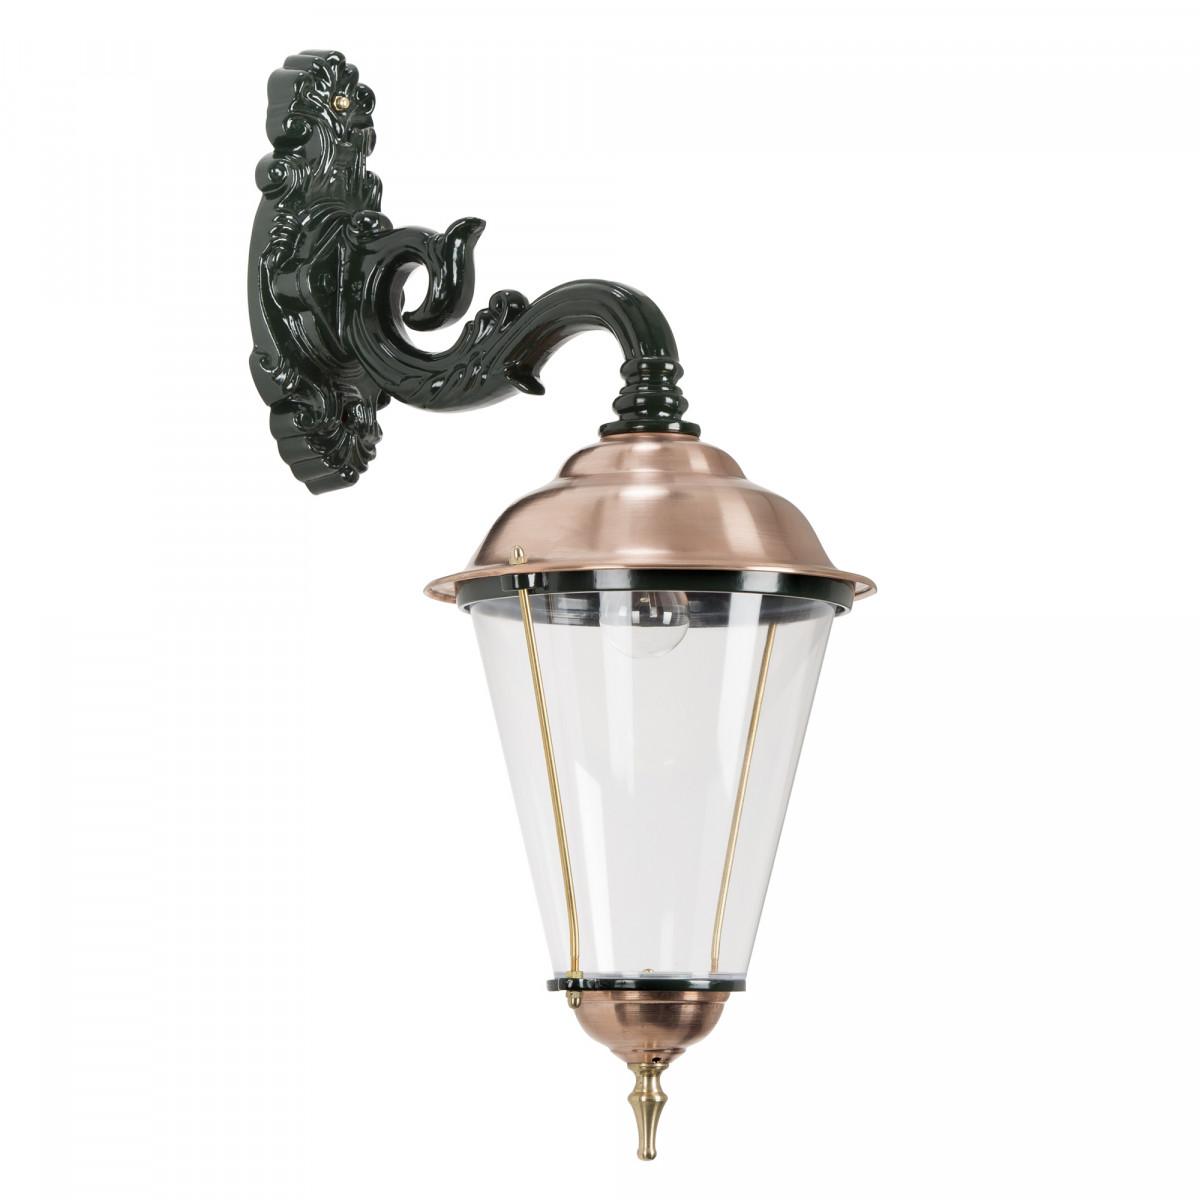 Volendam 3 hang L (1313) - KS Verlichting - Buitenlichting Rond